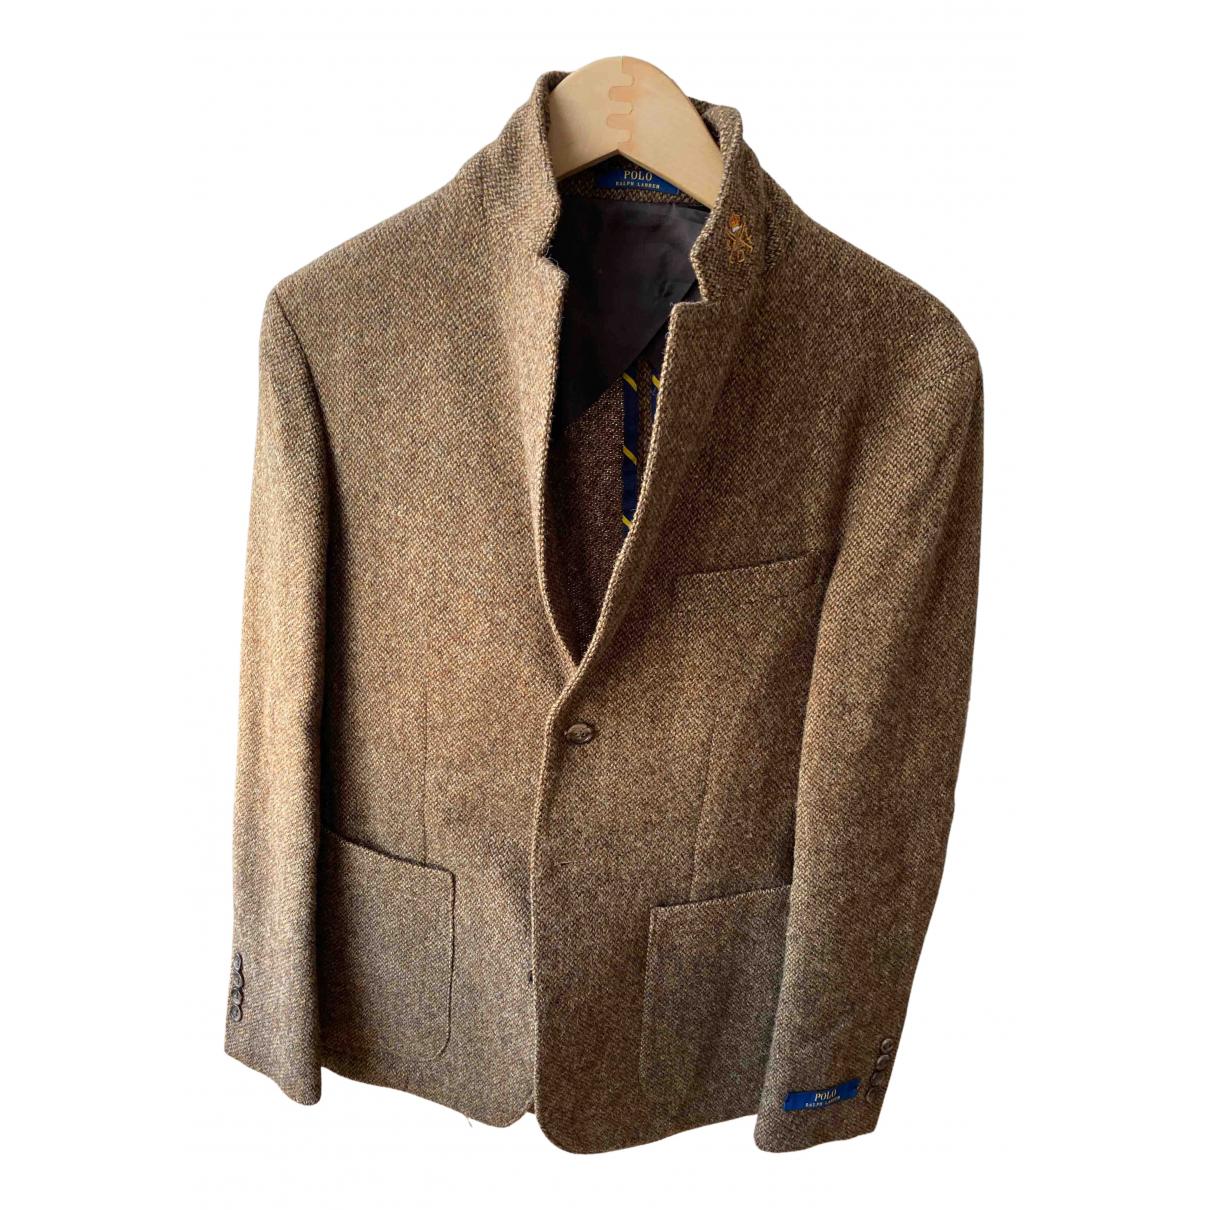 Polo Ralph Lauren \N Jacke in  Braun Wolle